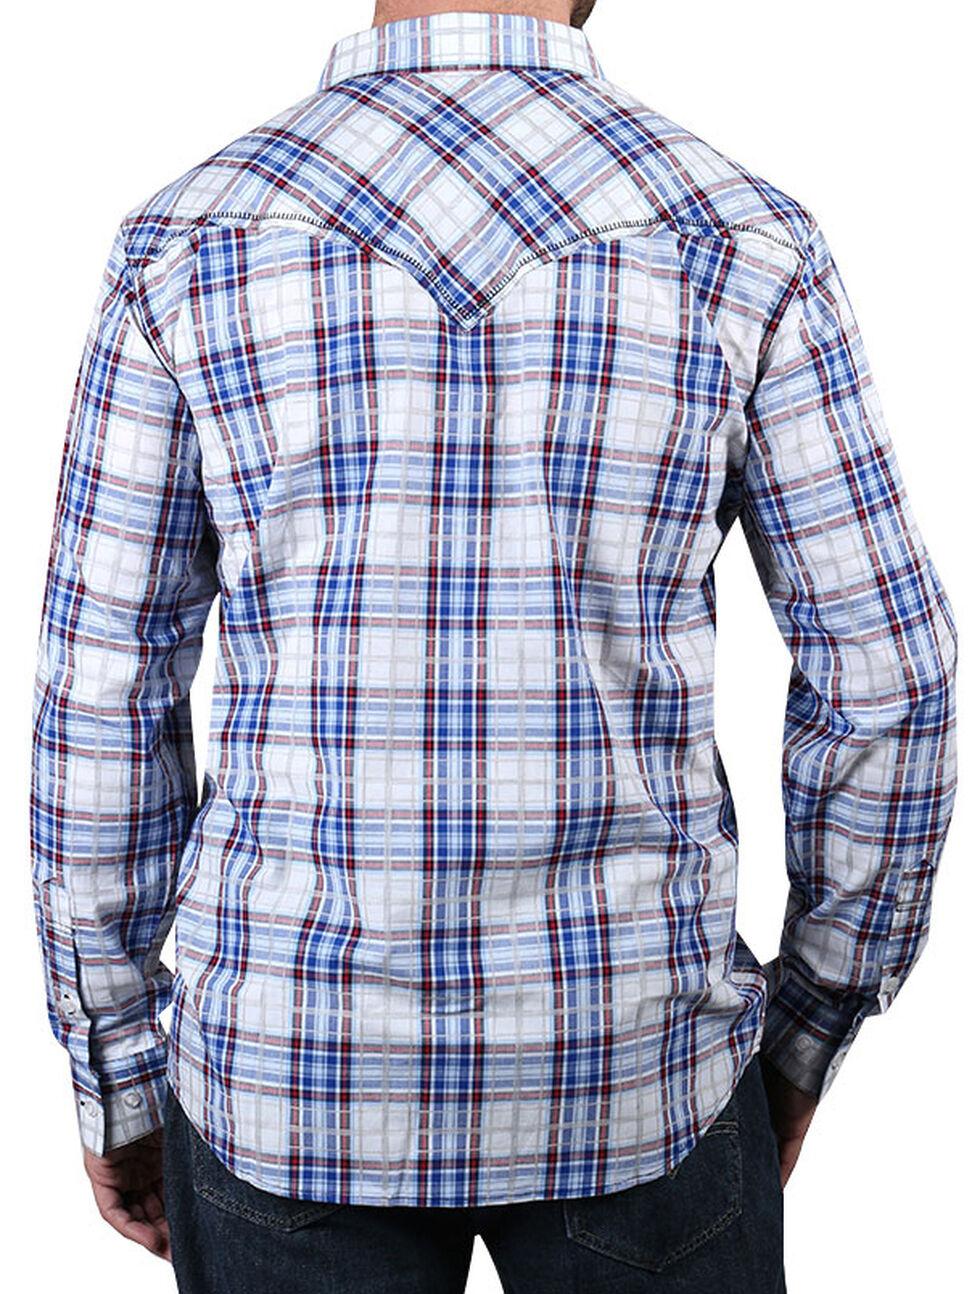 Cody James Men's Trapper's Tail Plaid Western Shirt, White, hi-res